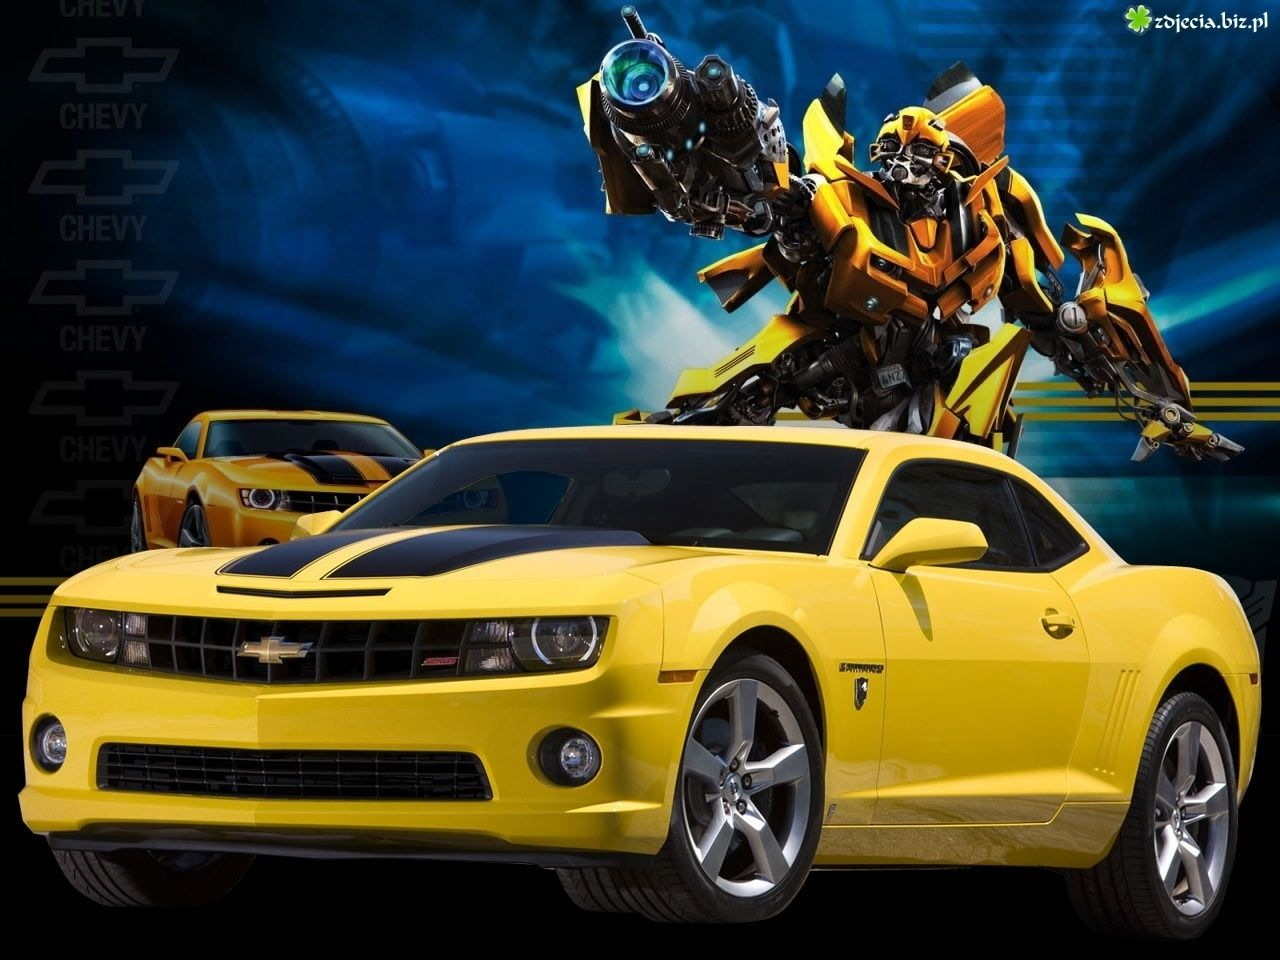 Transformers Chevy Camaro Zdjęcie Żółty Chevrolet